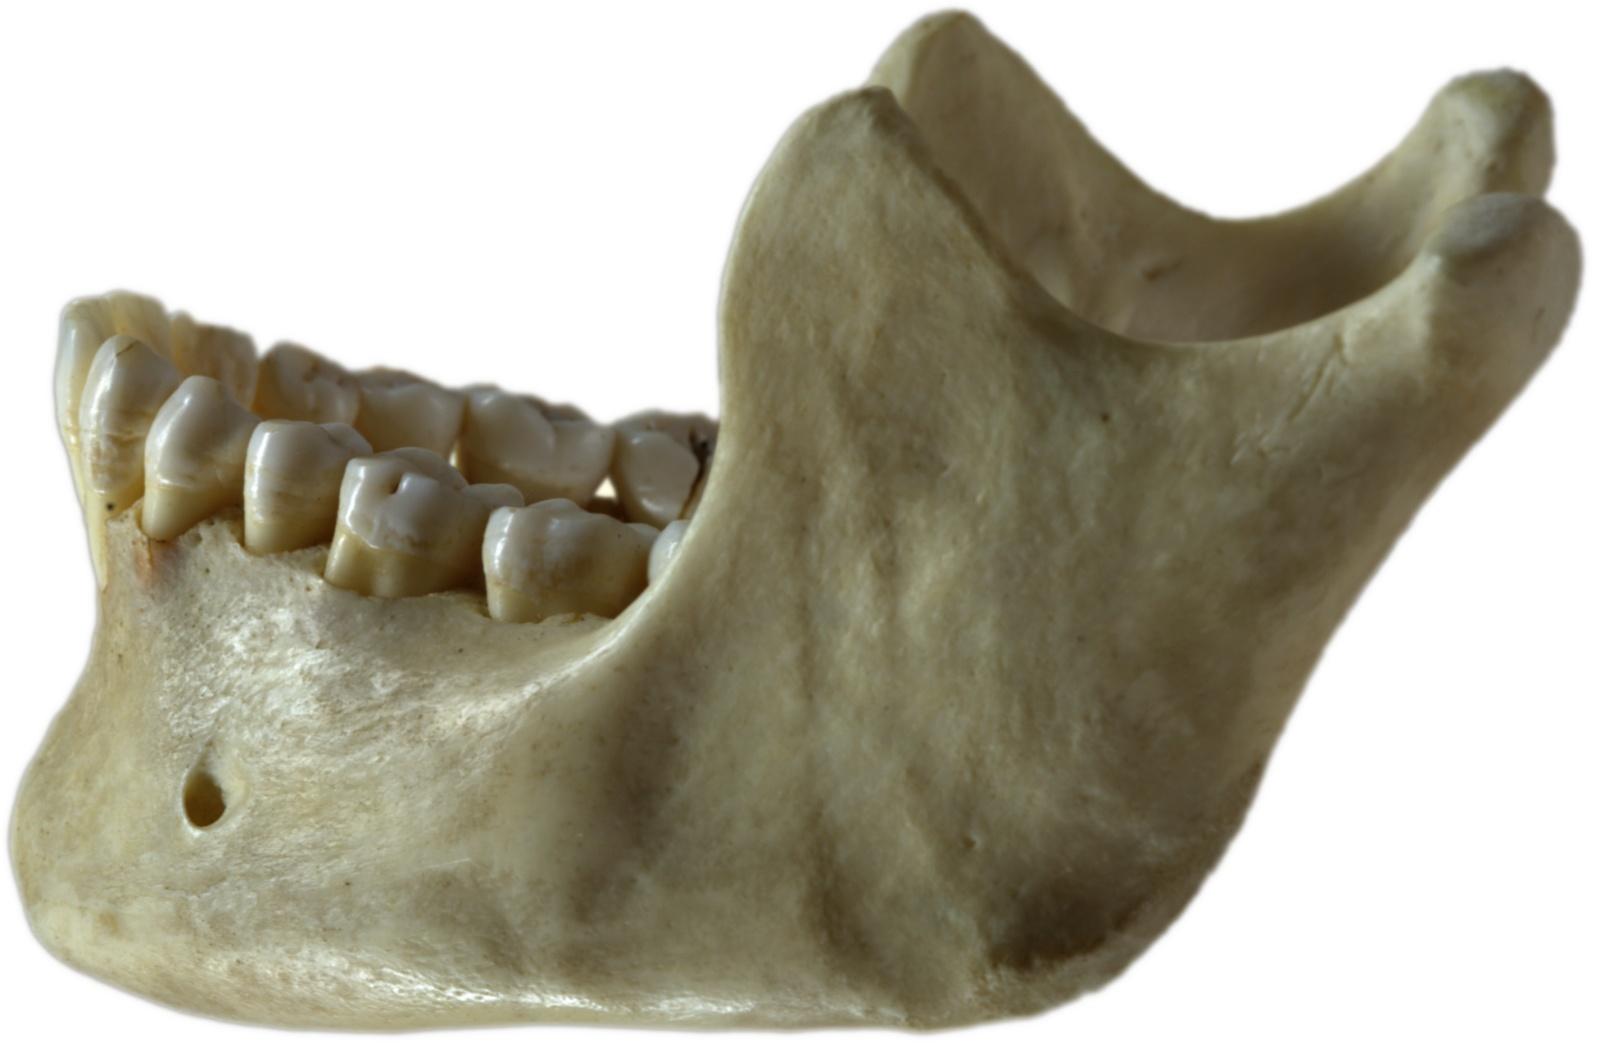 Human_jawbone_left.jpg